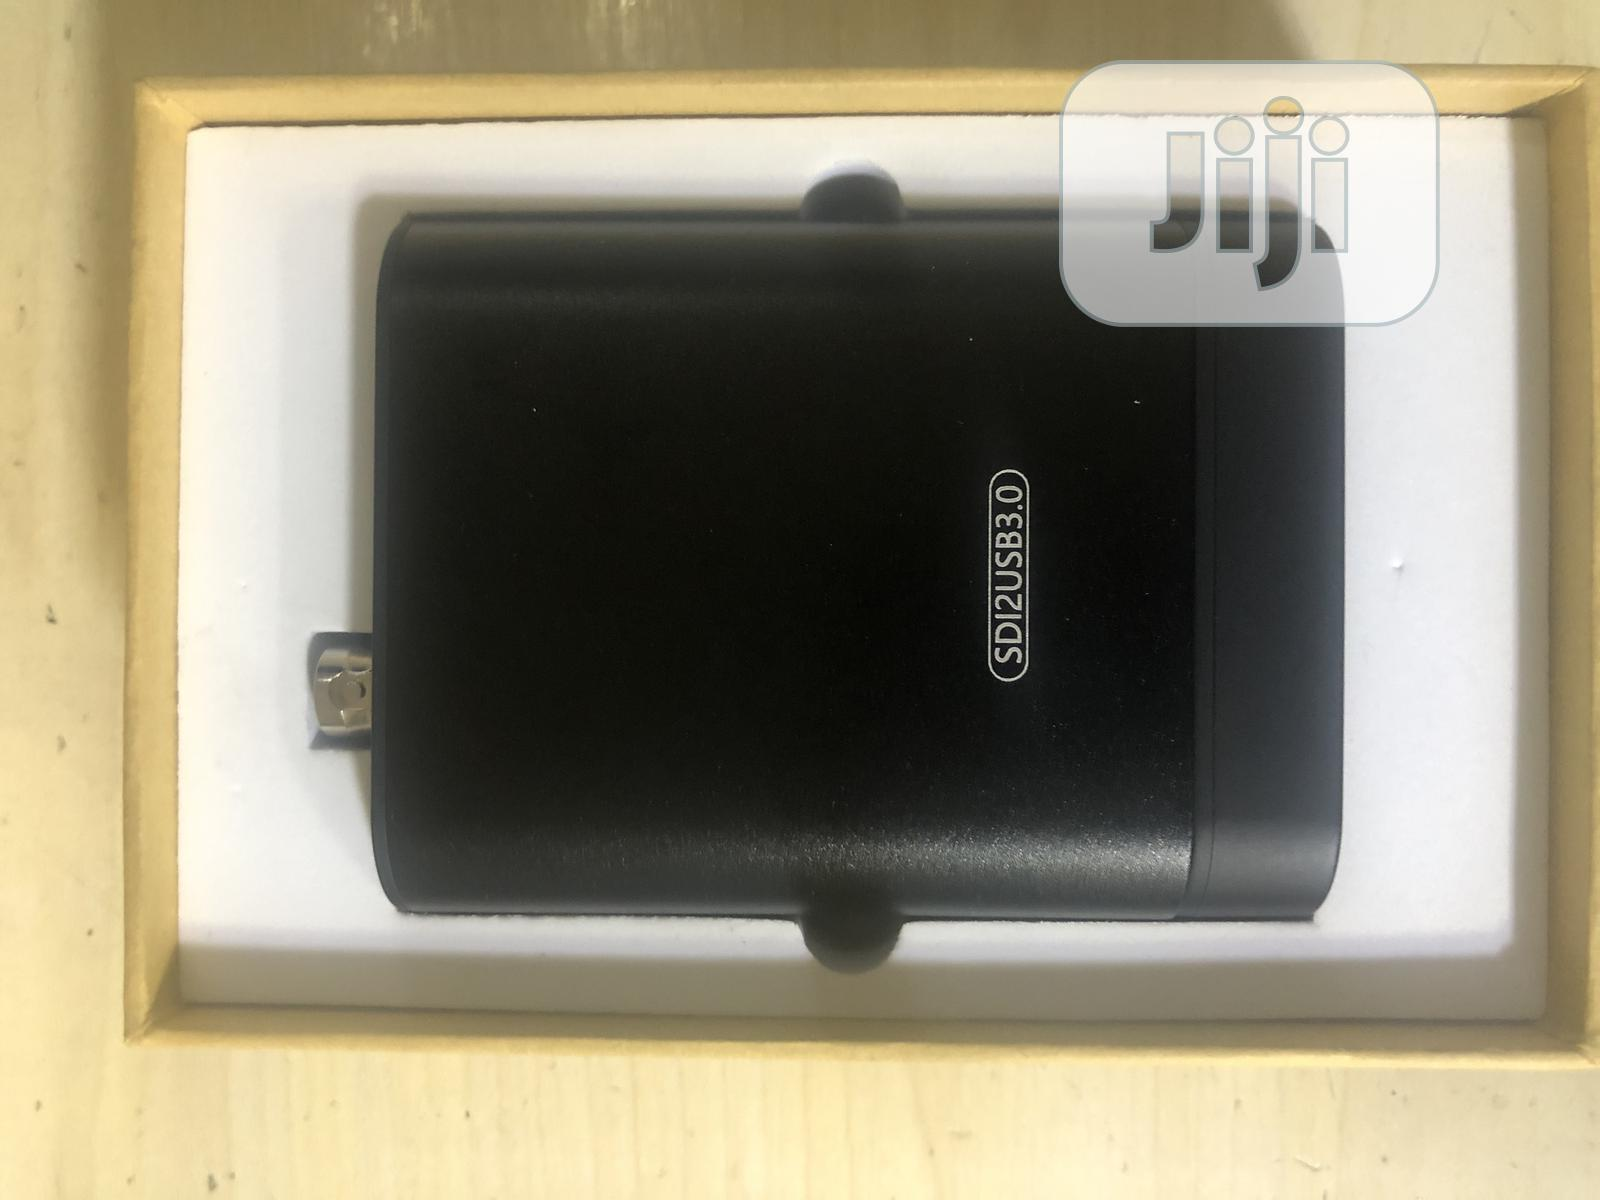 HD 3G SDI To USB3.0 Capture Device Fullhd 1080 60fp